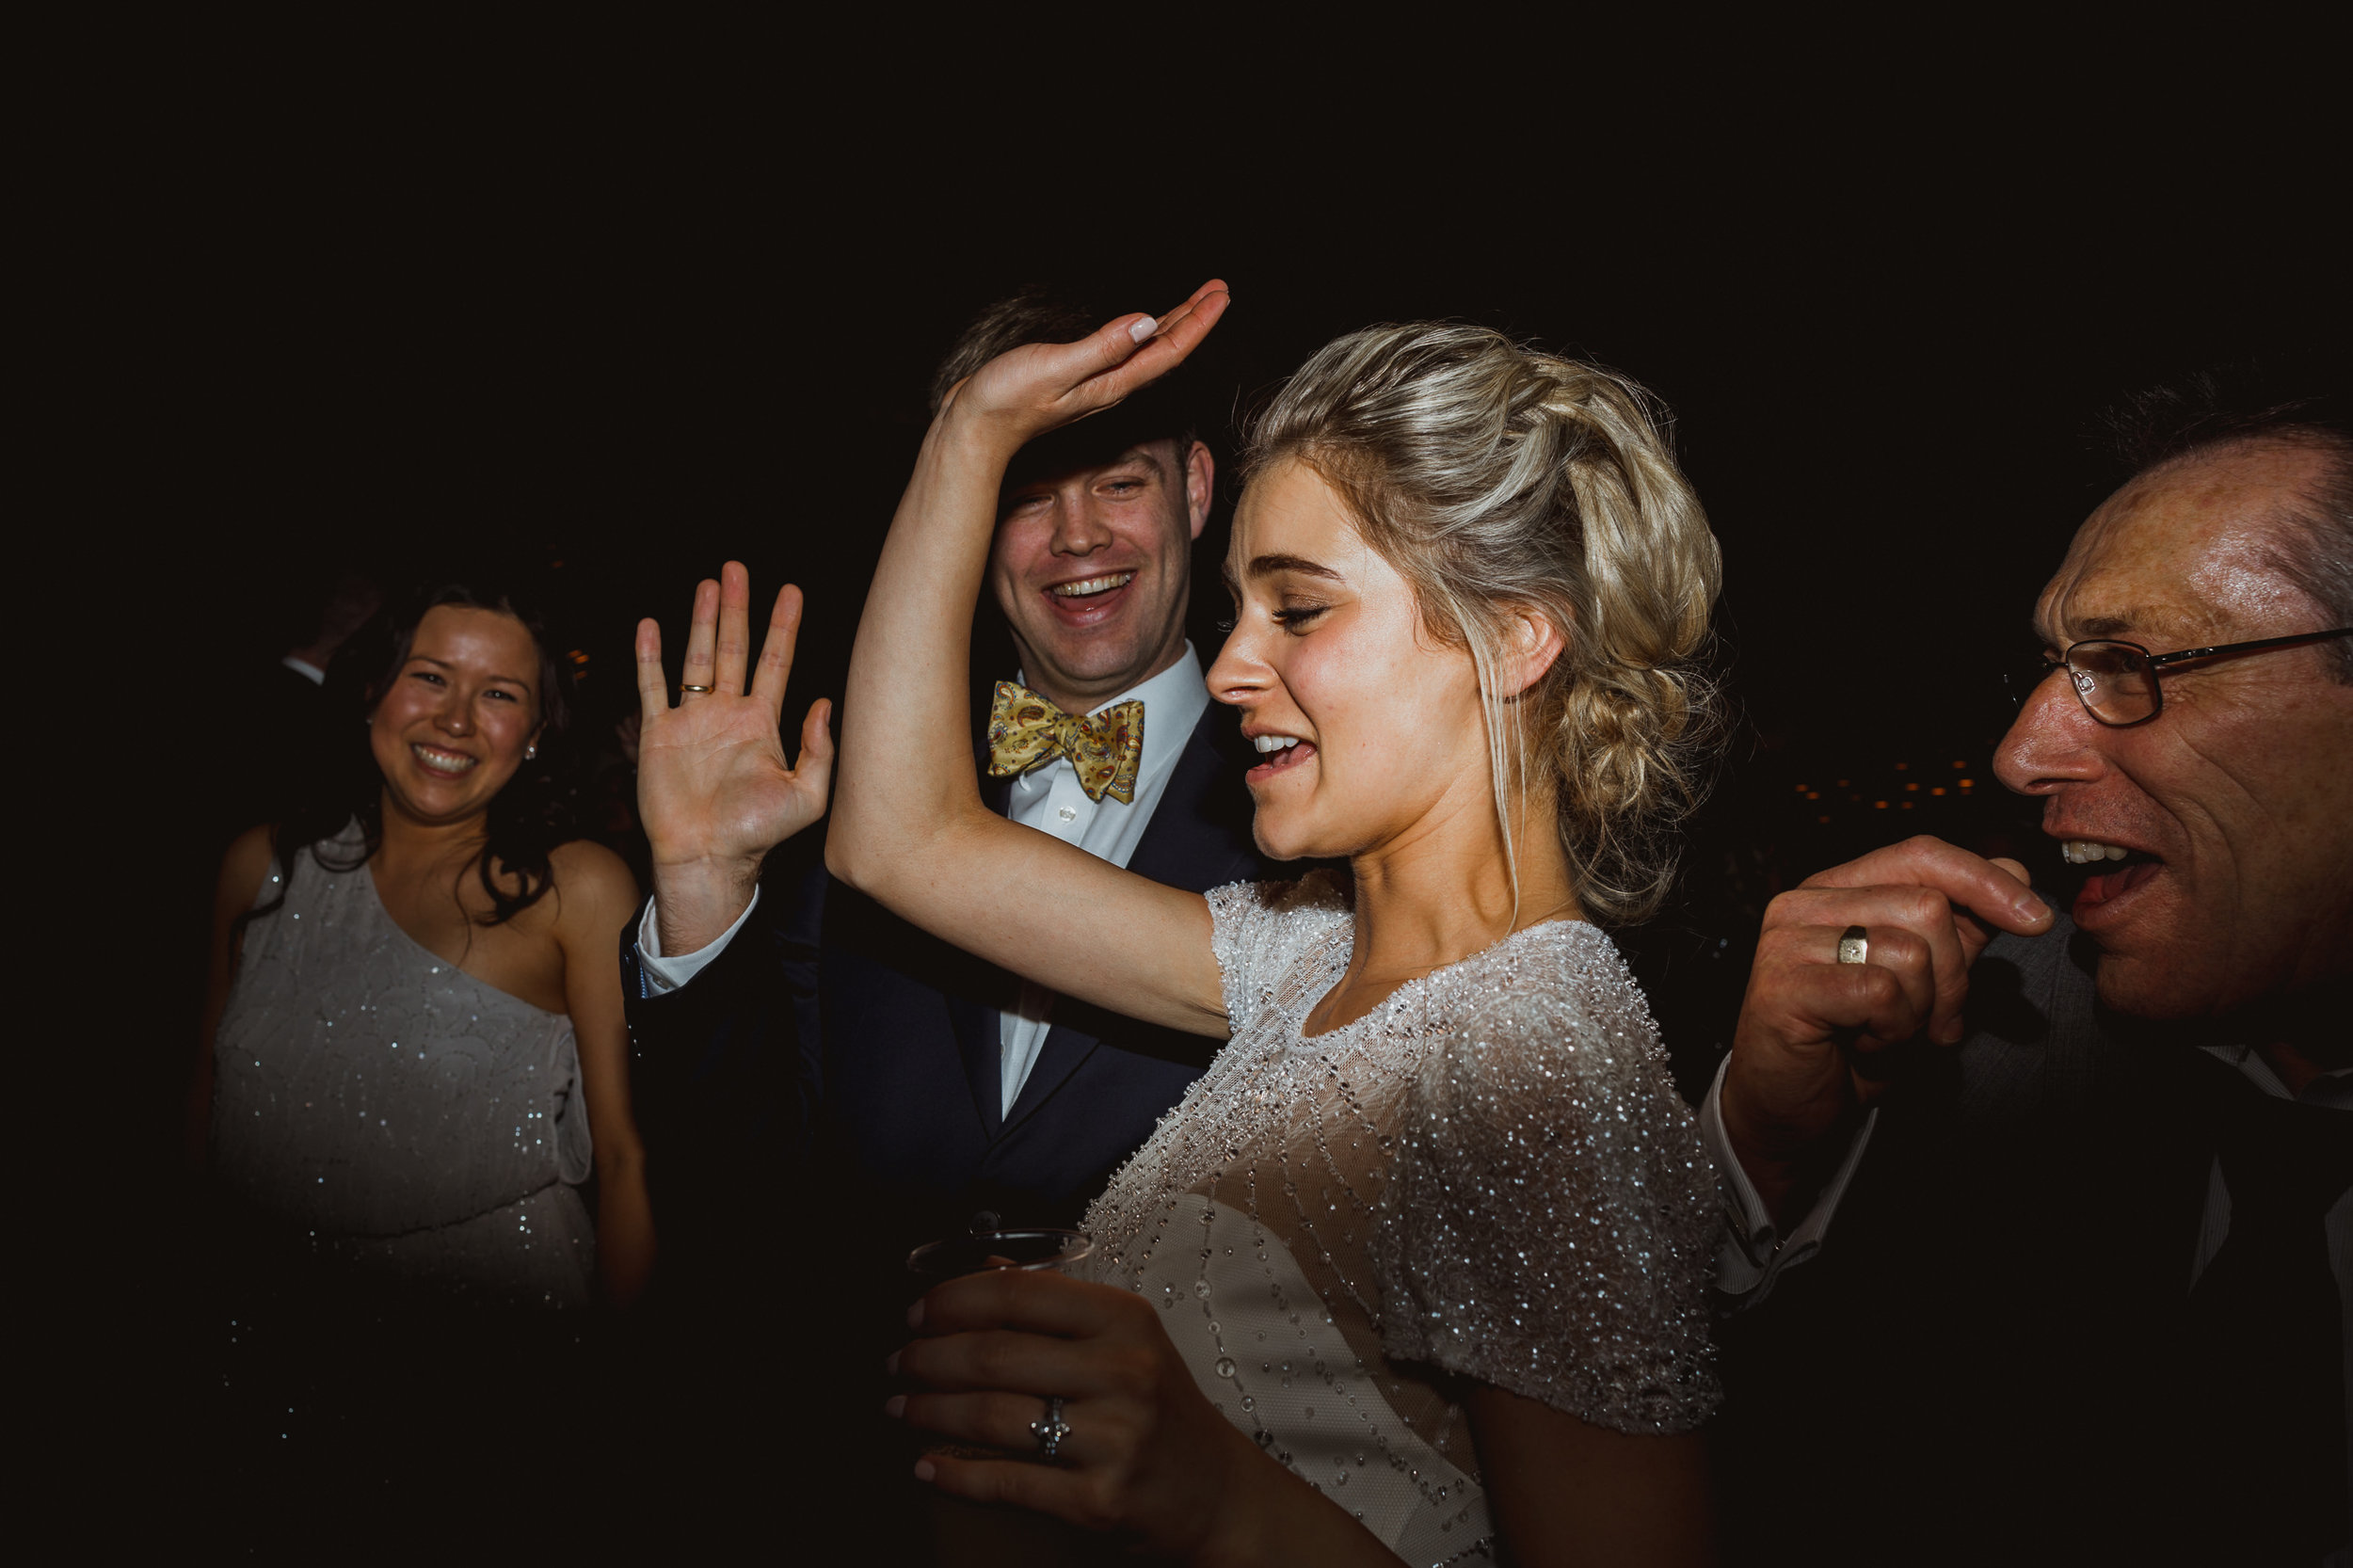 Jenny Packham dress Bury Court Barn Hampshire Wedding Photographer Gione da Silva_040.jpg